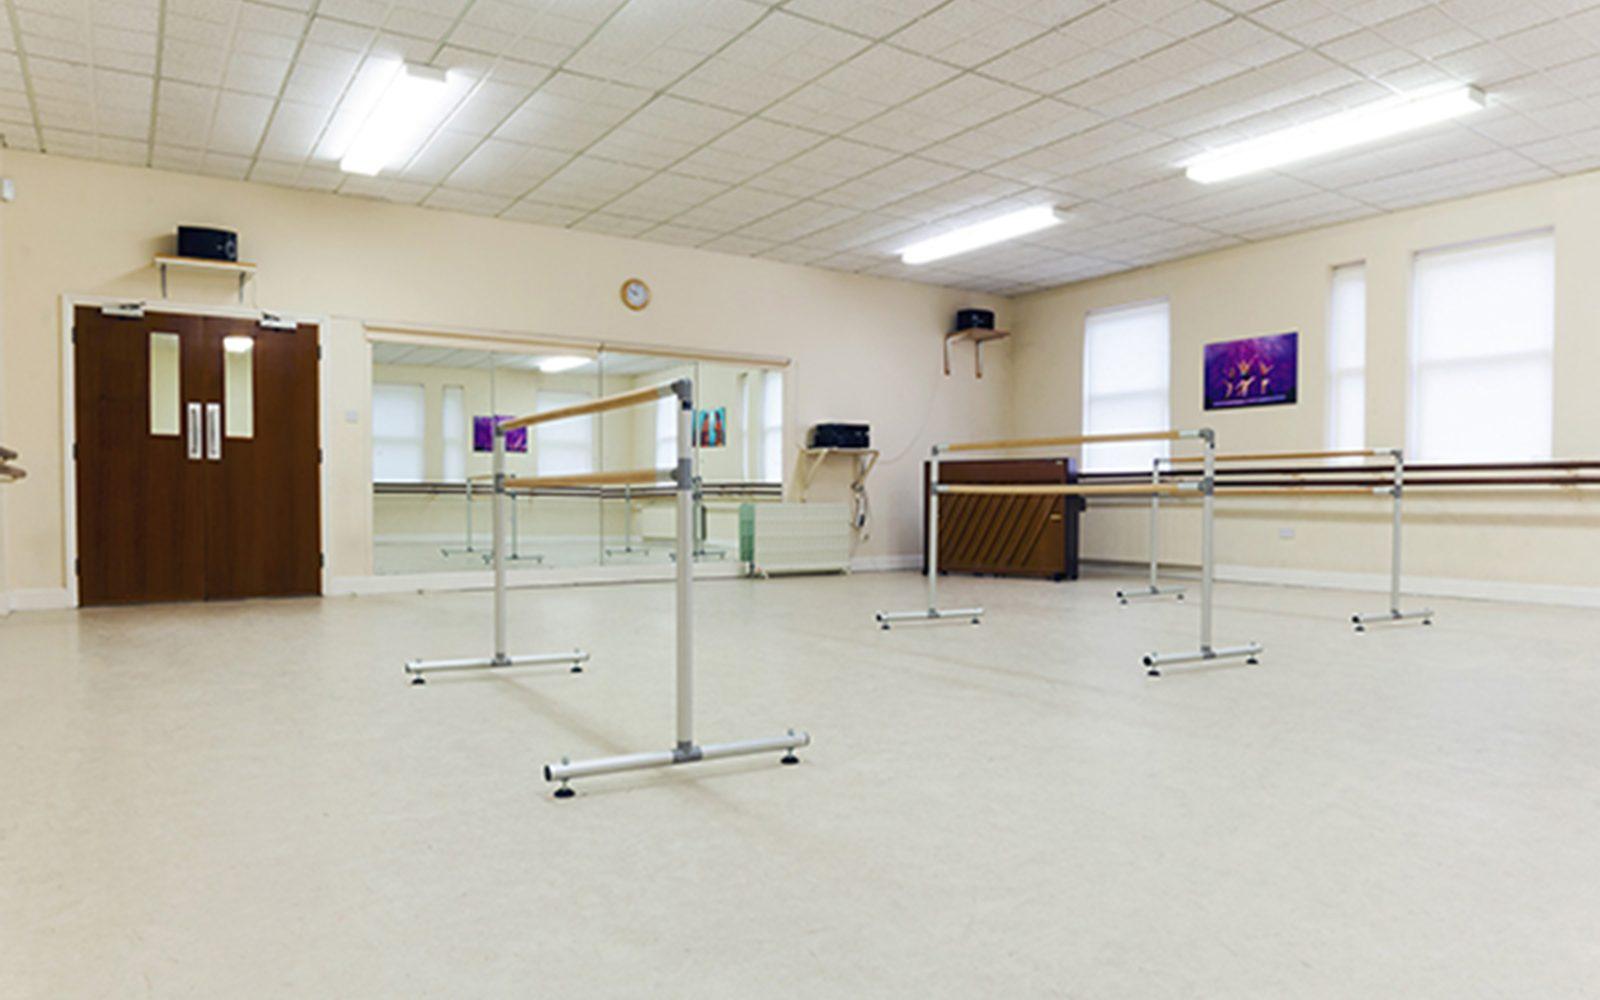 Studio with dance rail